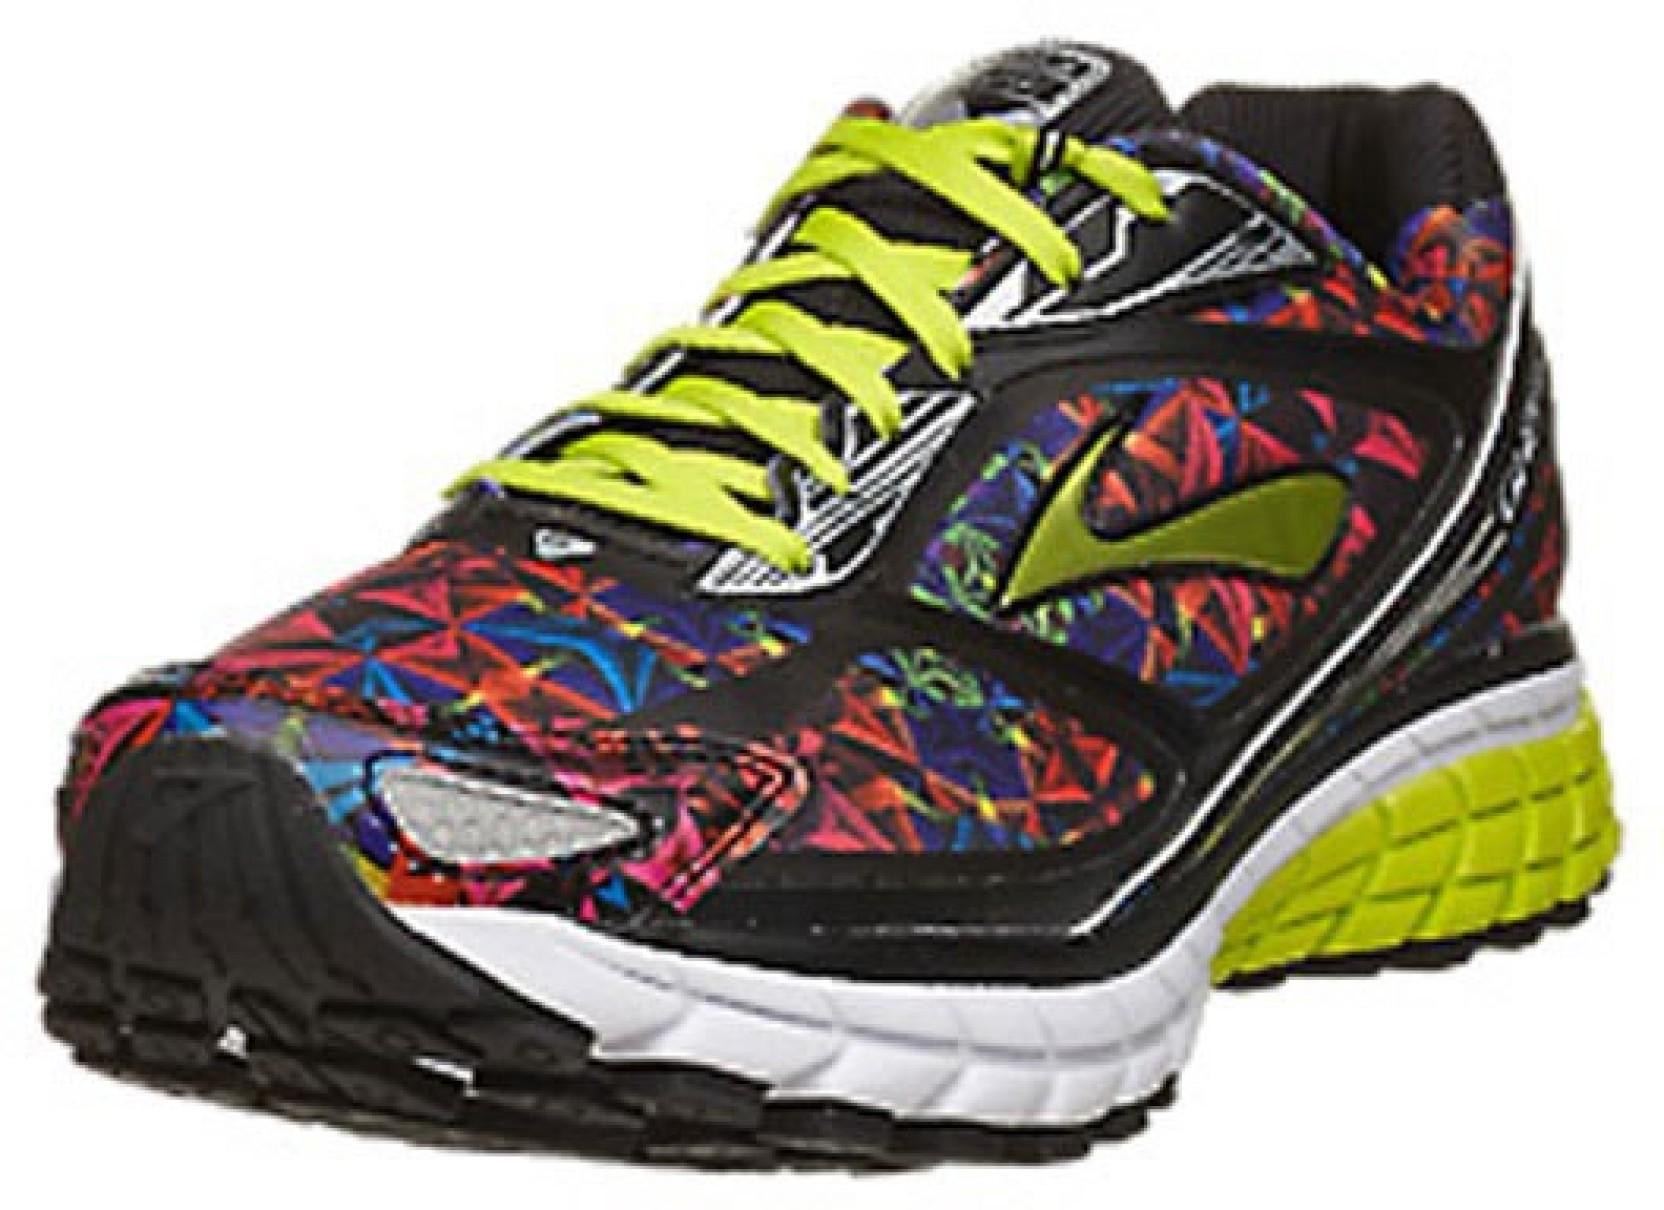 cc9ffba296438 Brooks Ghost 7 Men s Running Shoes For Men - Buy Kaleidoscope Color ...